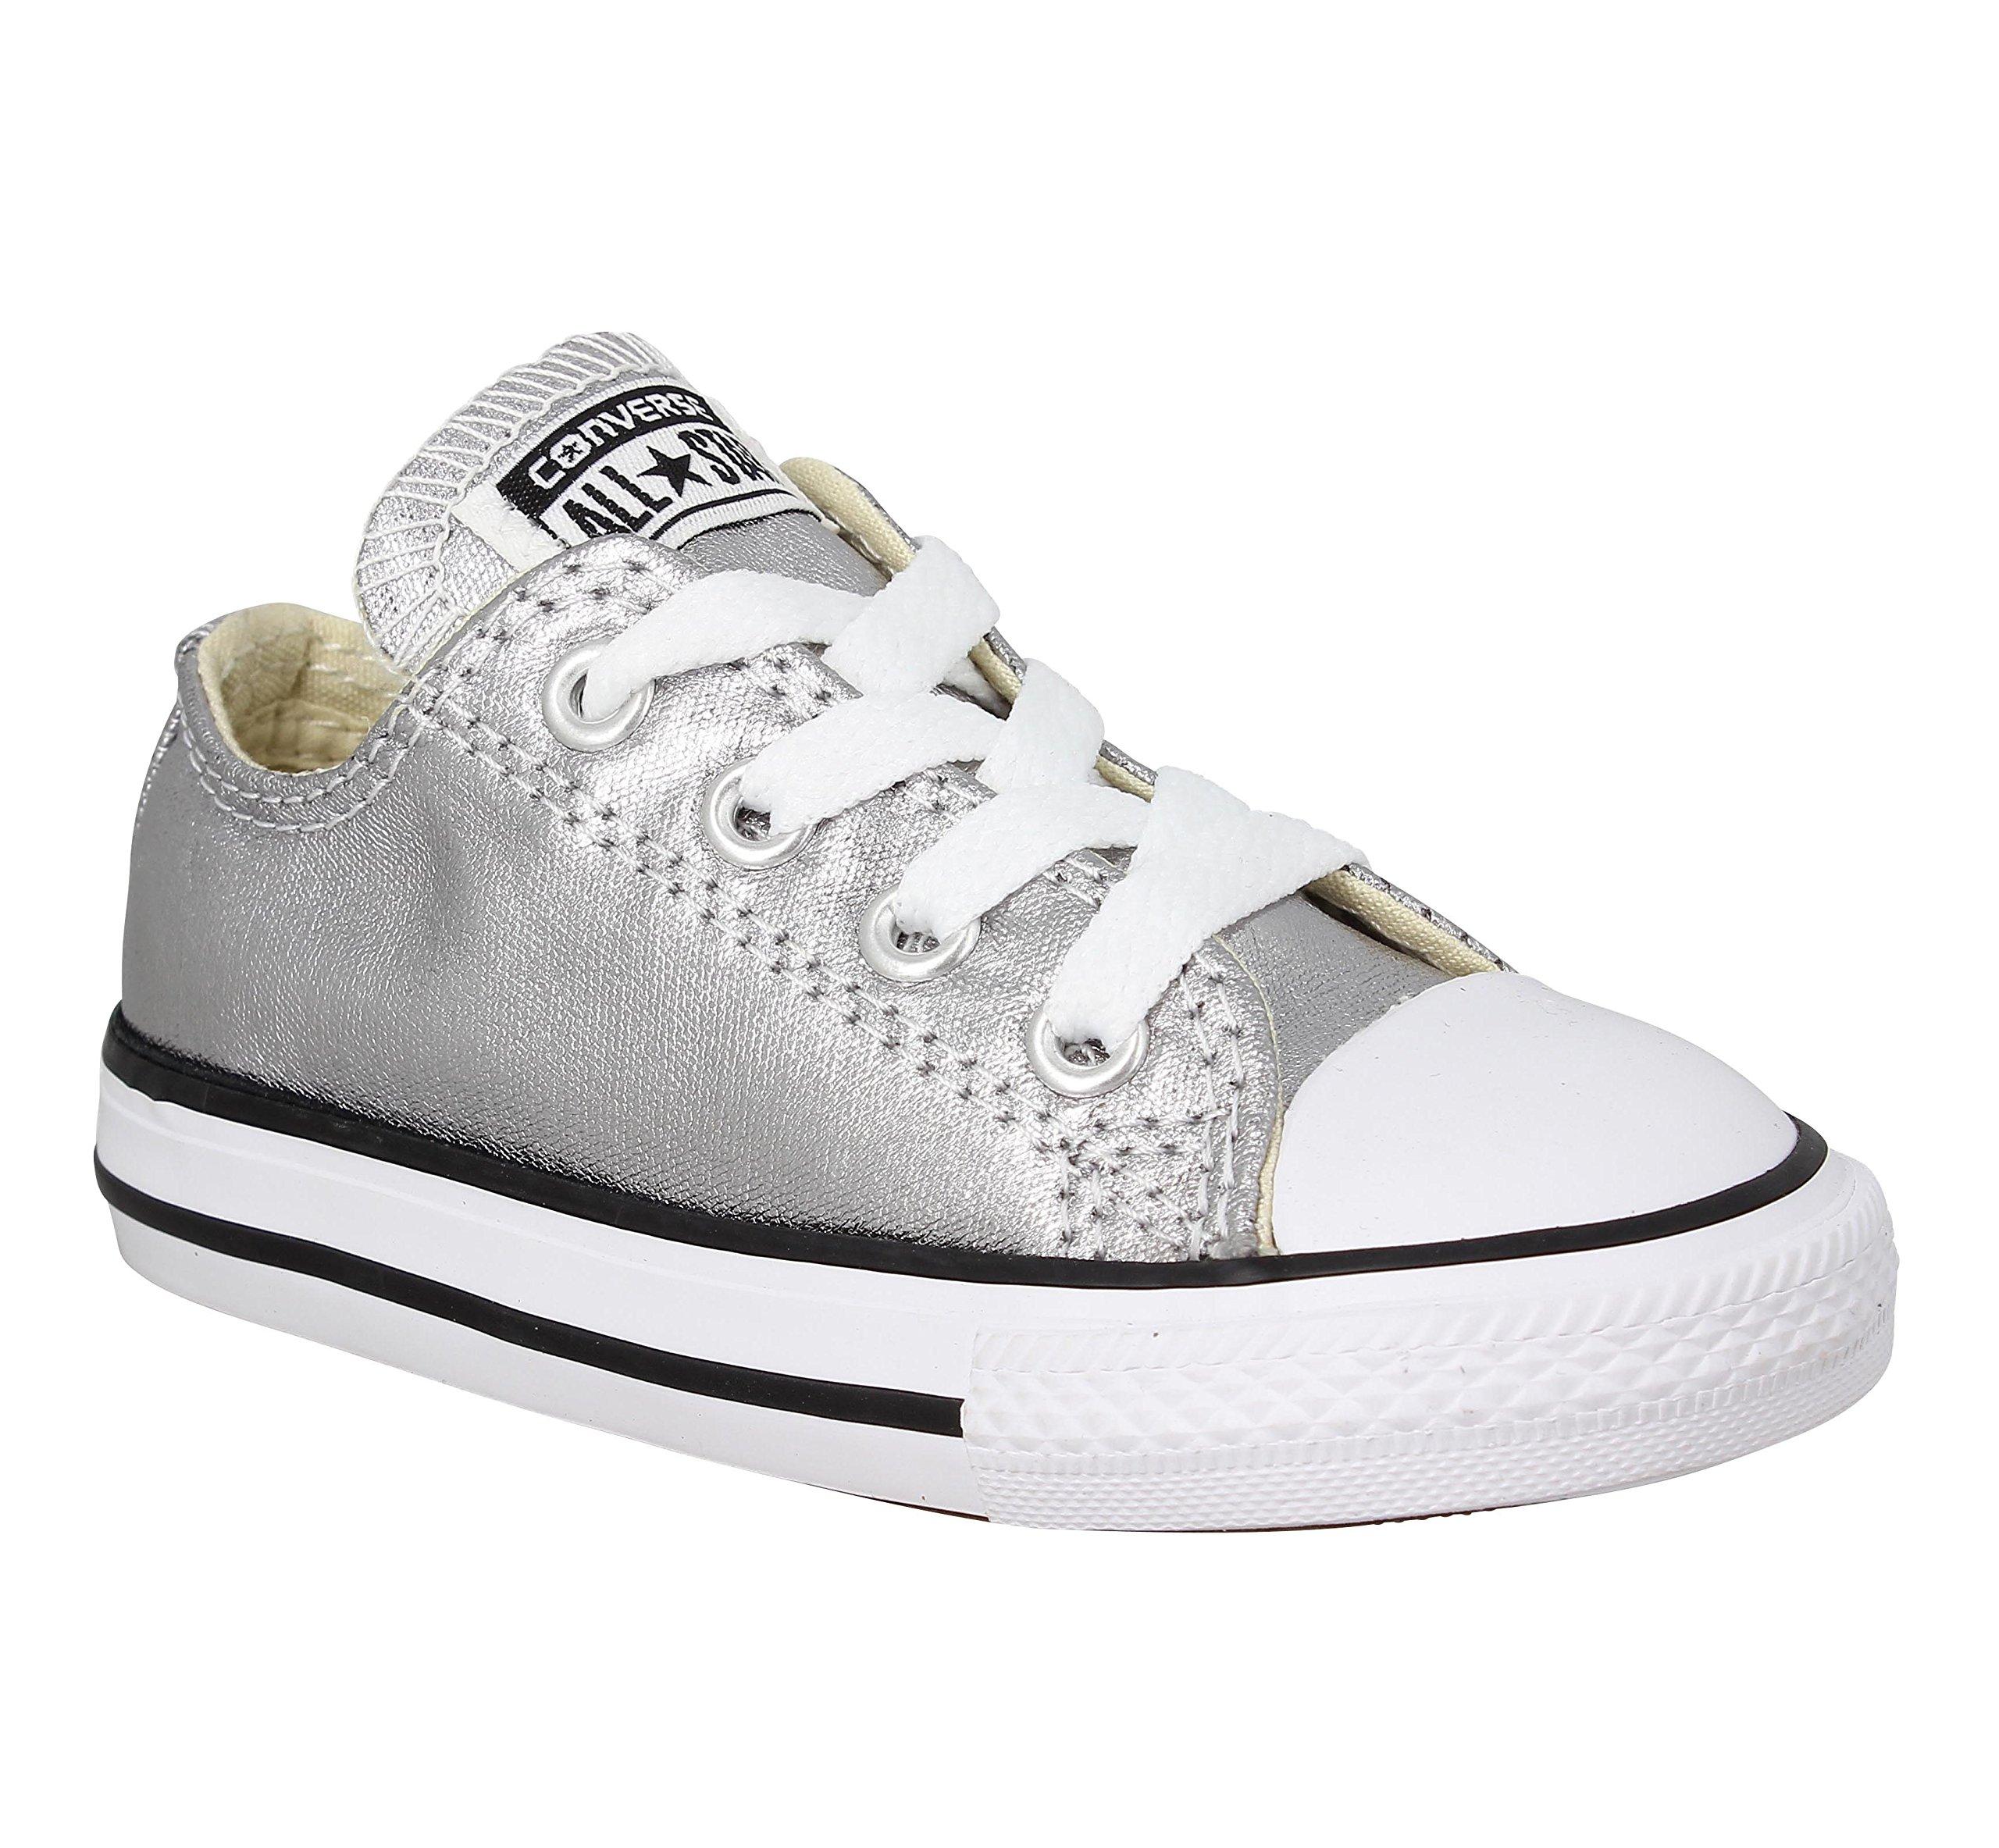 d860117b Converse Chuck Taylor All Star, Zapatillas de Lona Infantil product image